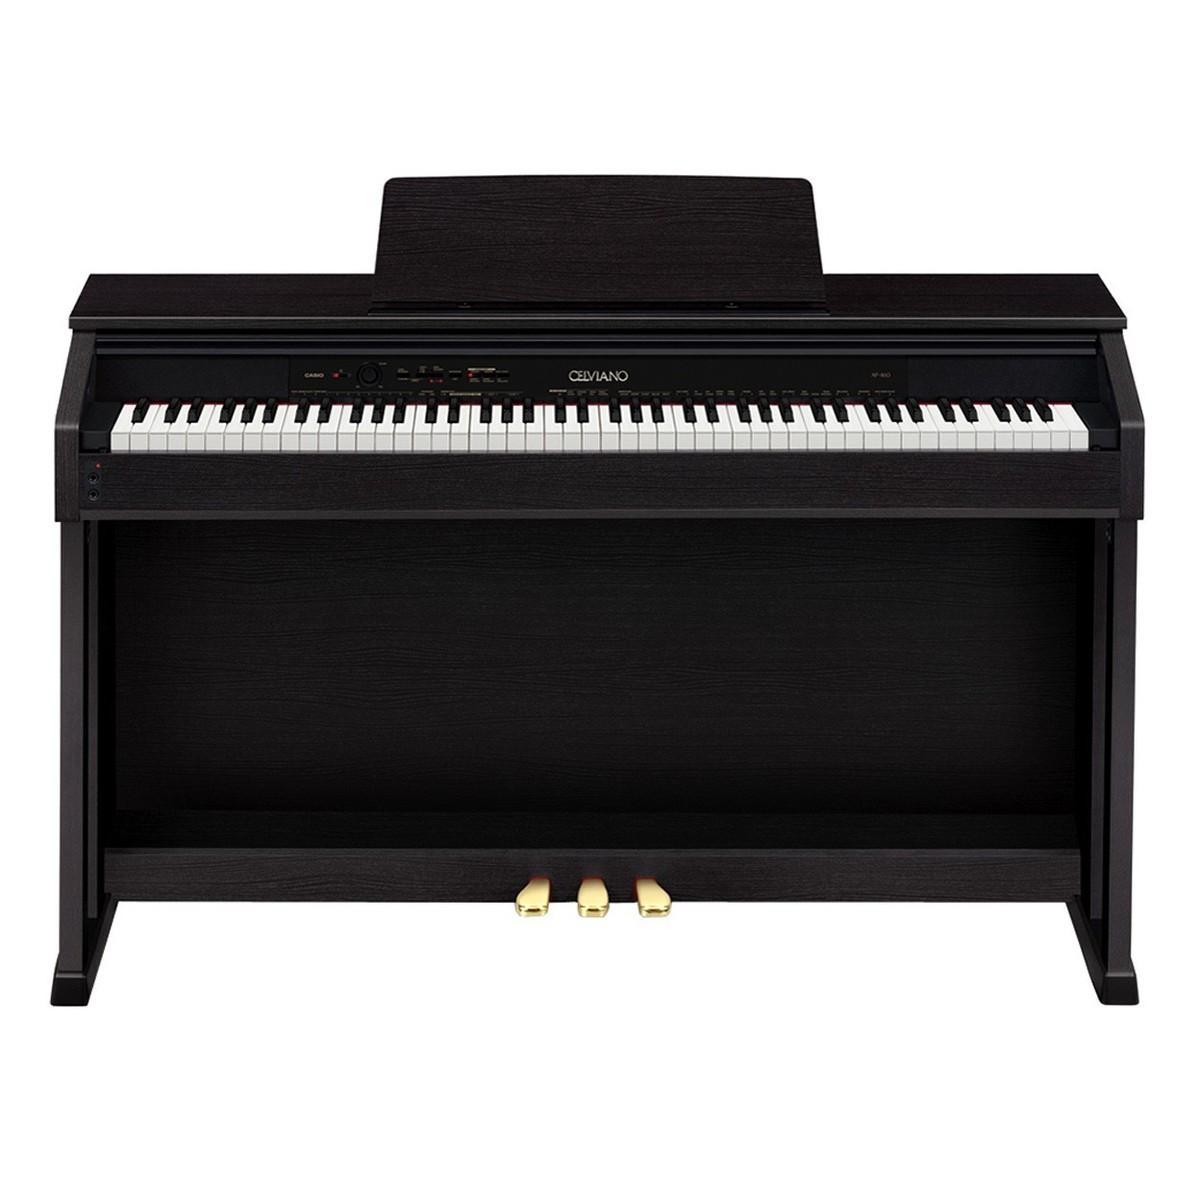 Image of Casio Celviano AP-460 Digital Piano